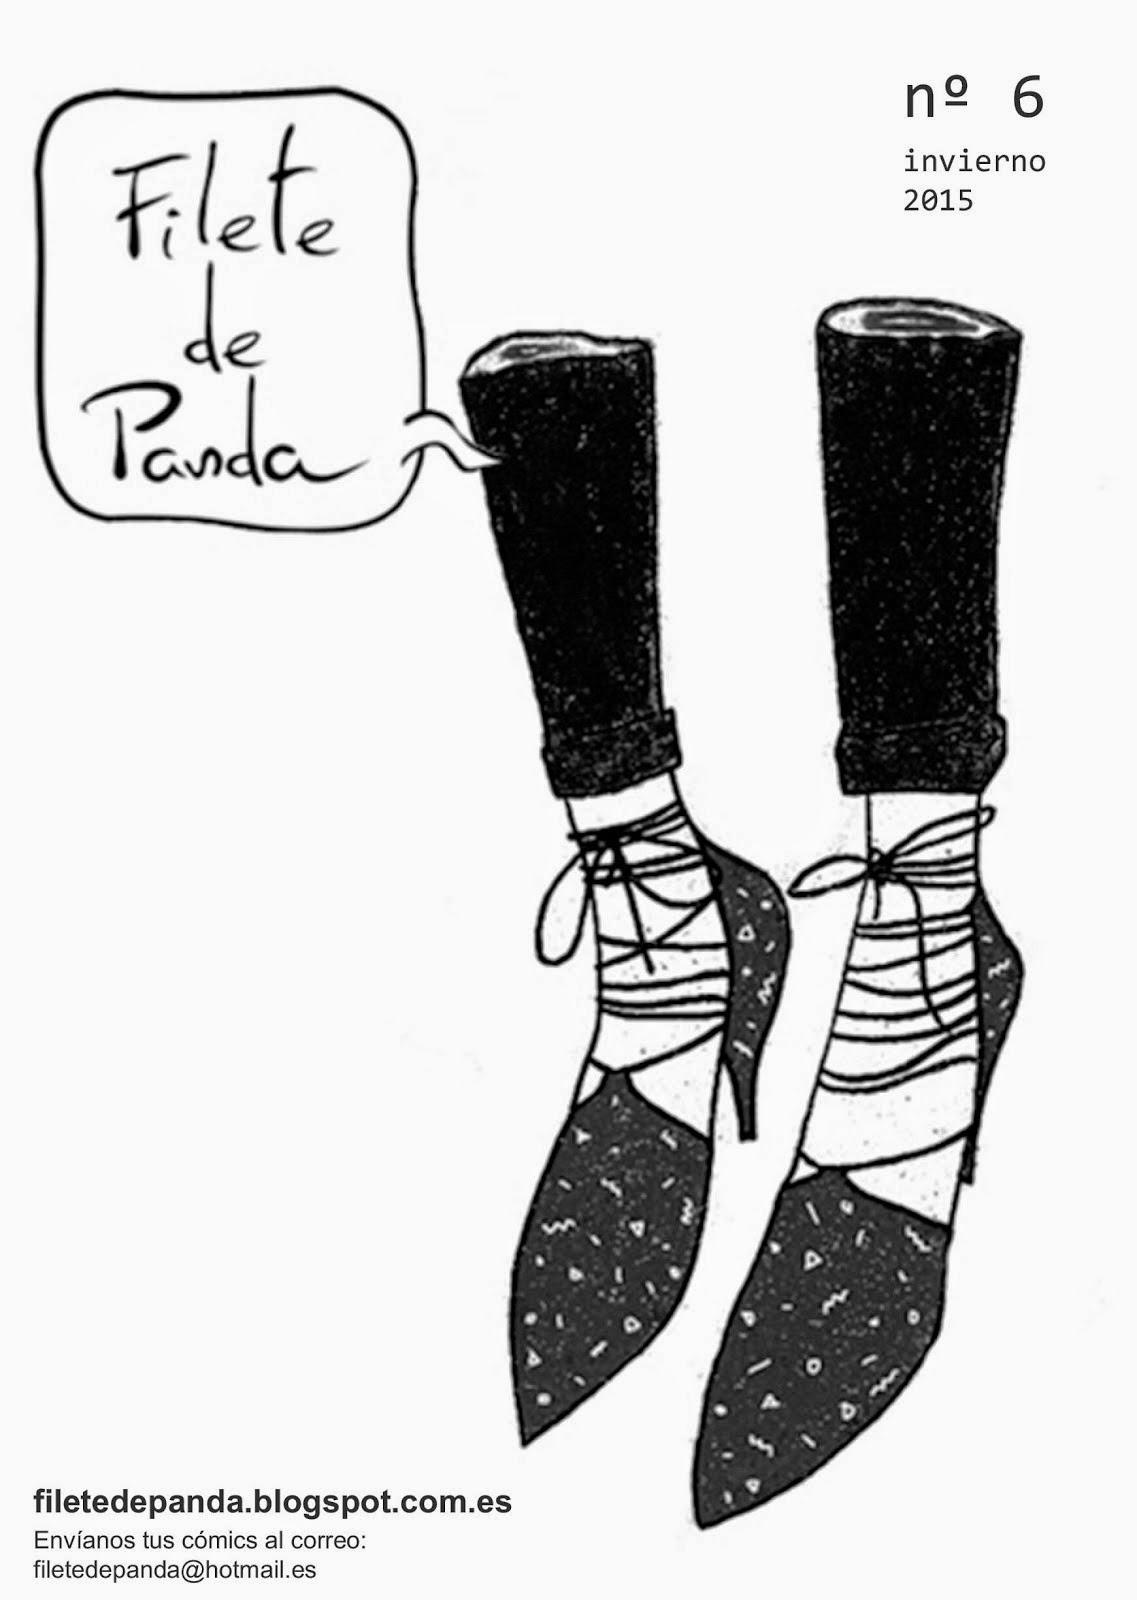 Filete de Panda 6 invierno 2015